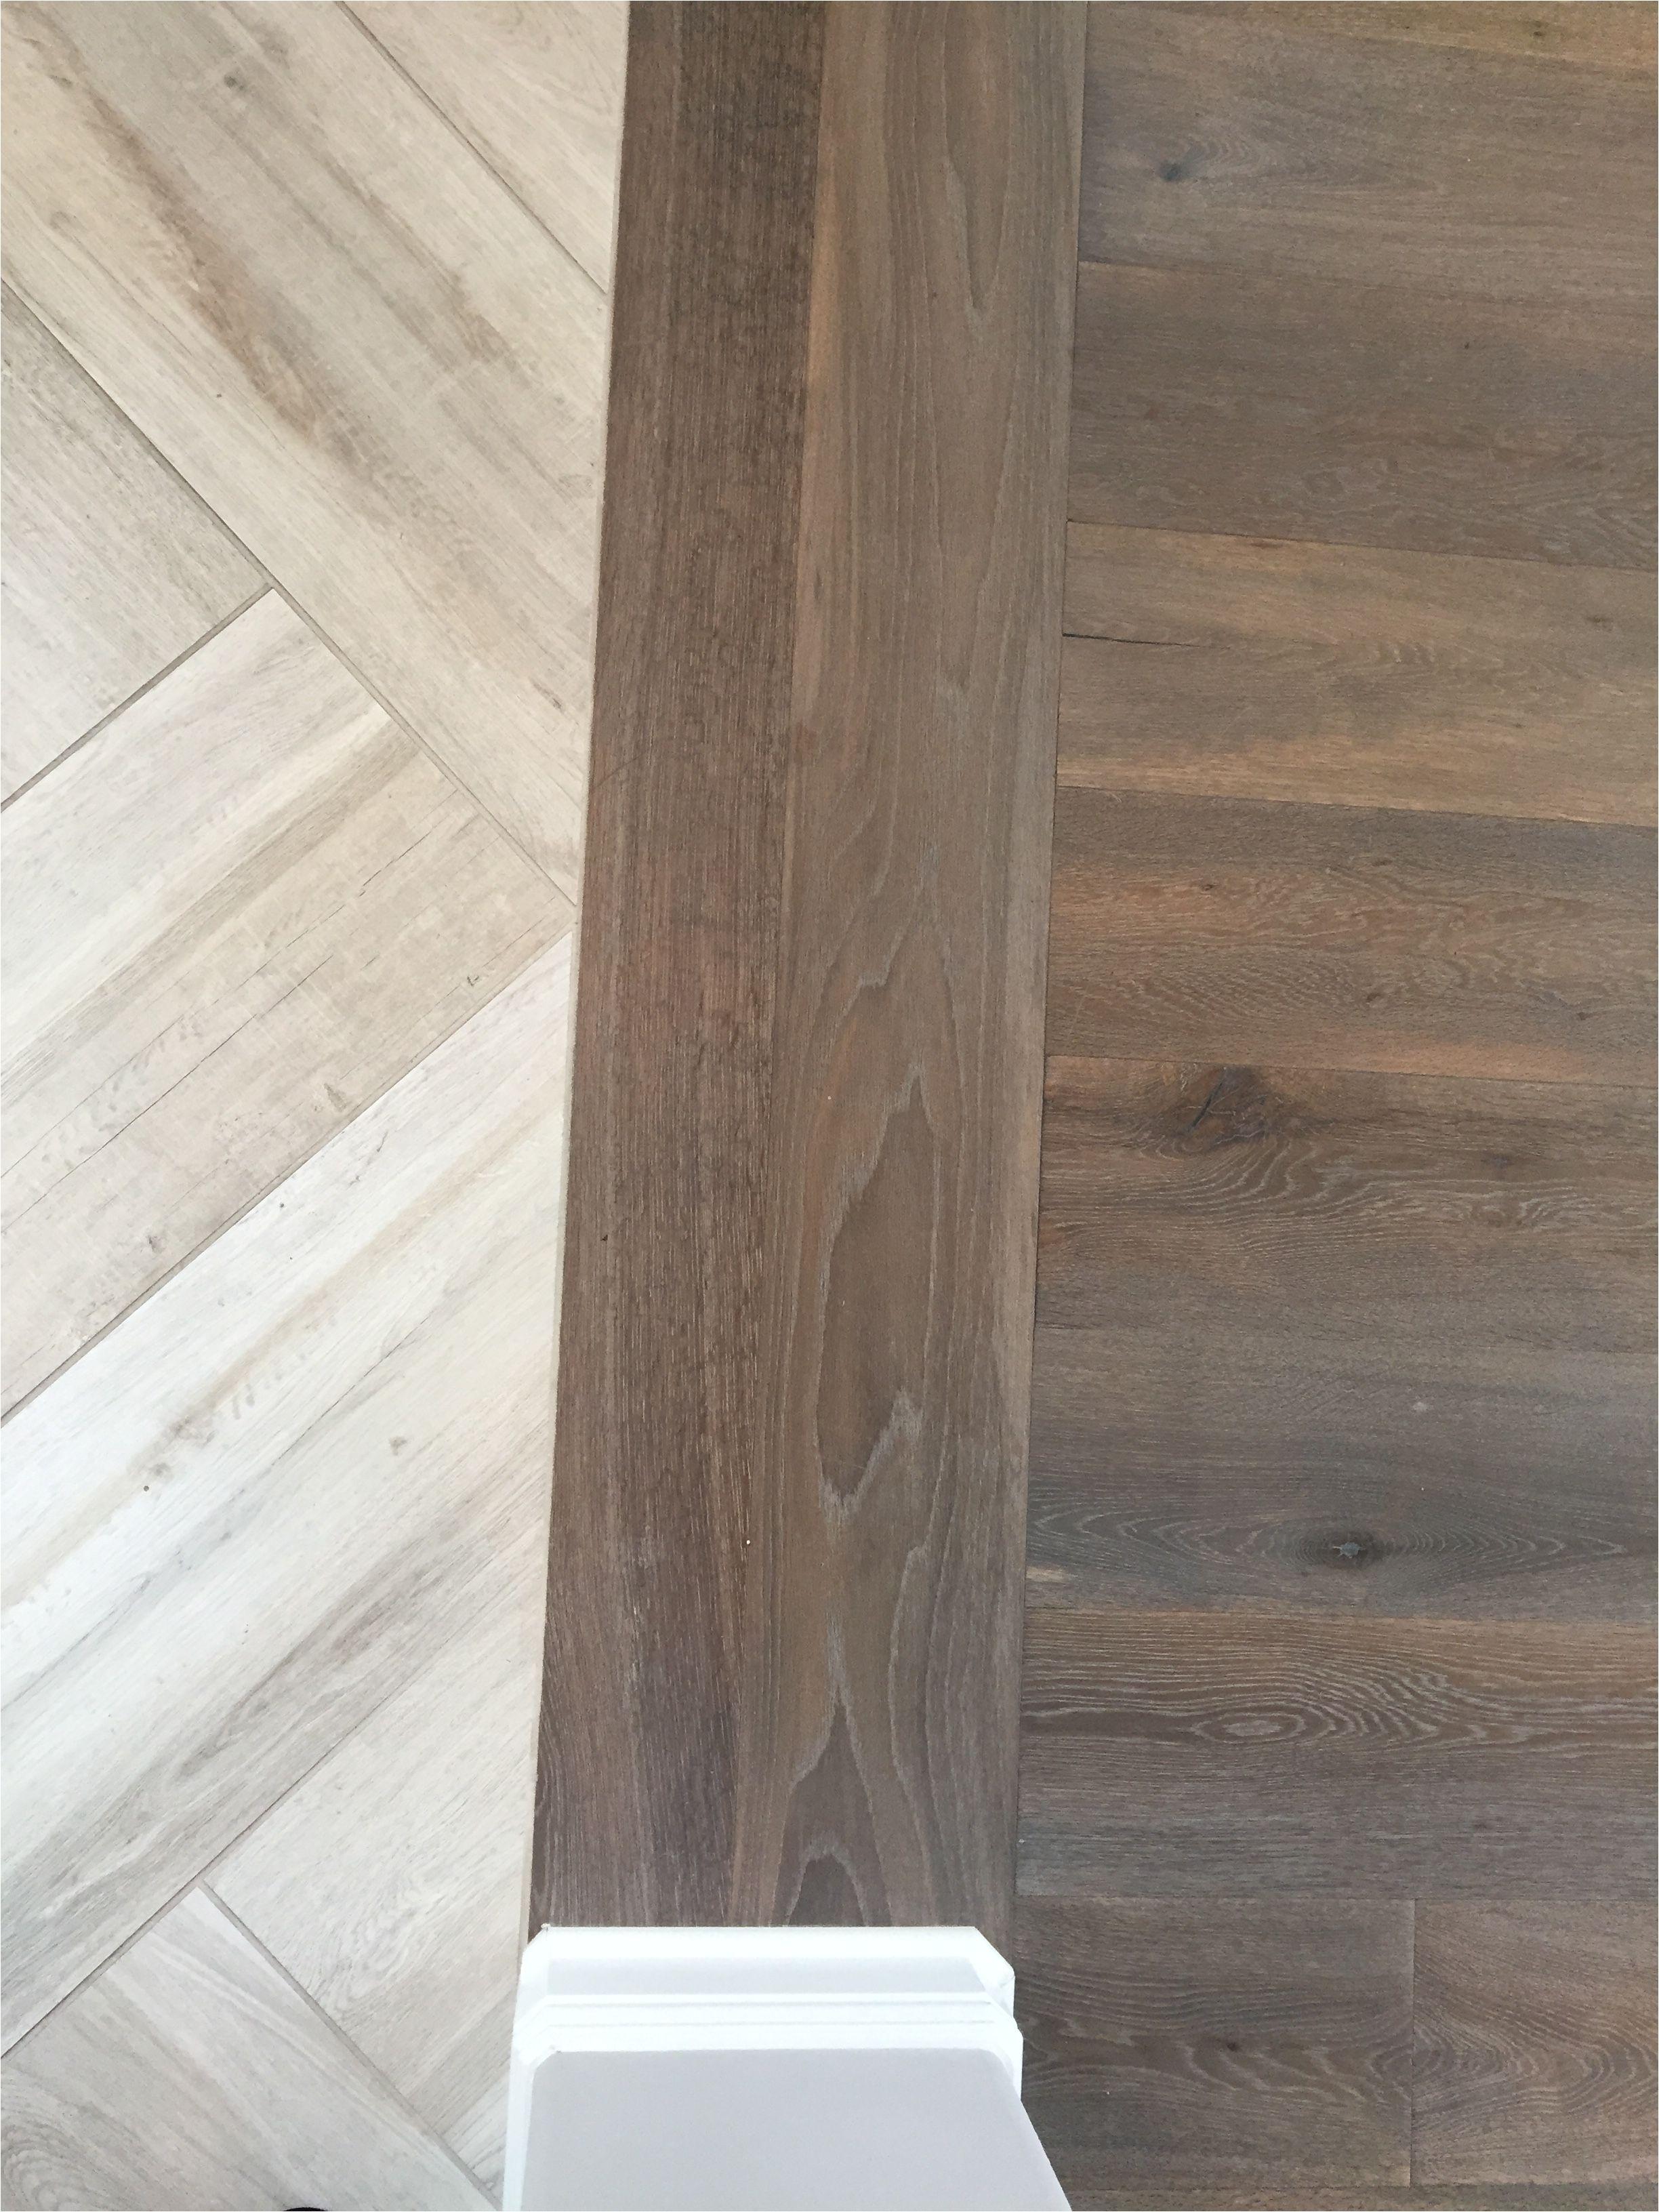 Wood Flooring for Mobile Homes Floor Transition Laminate to Herringbone Tile Pattern Model